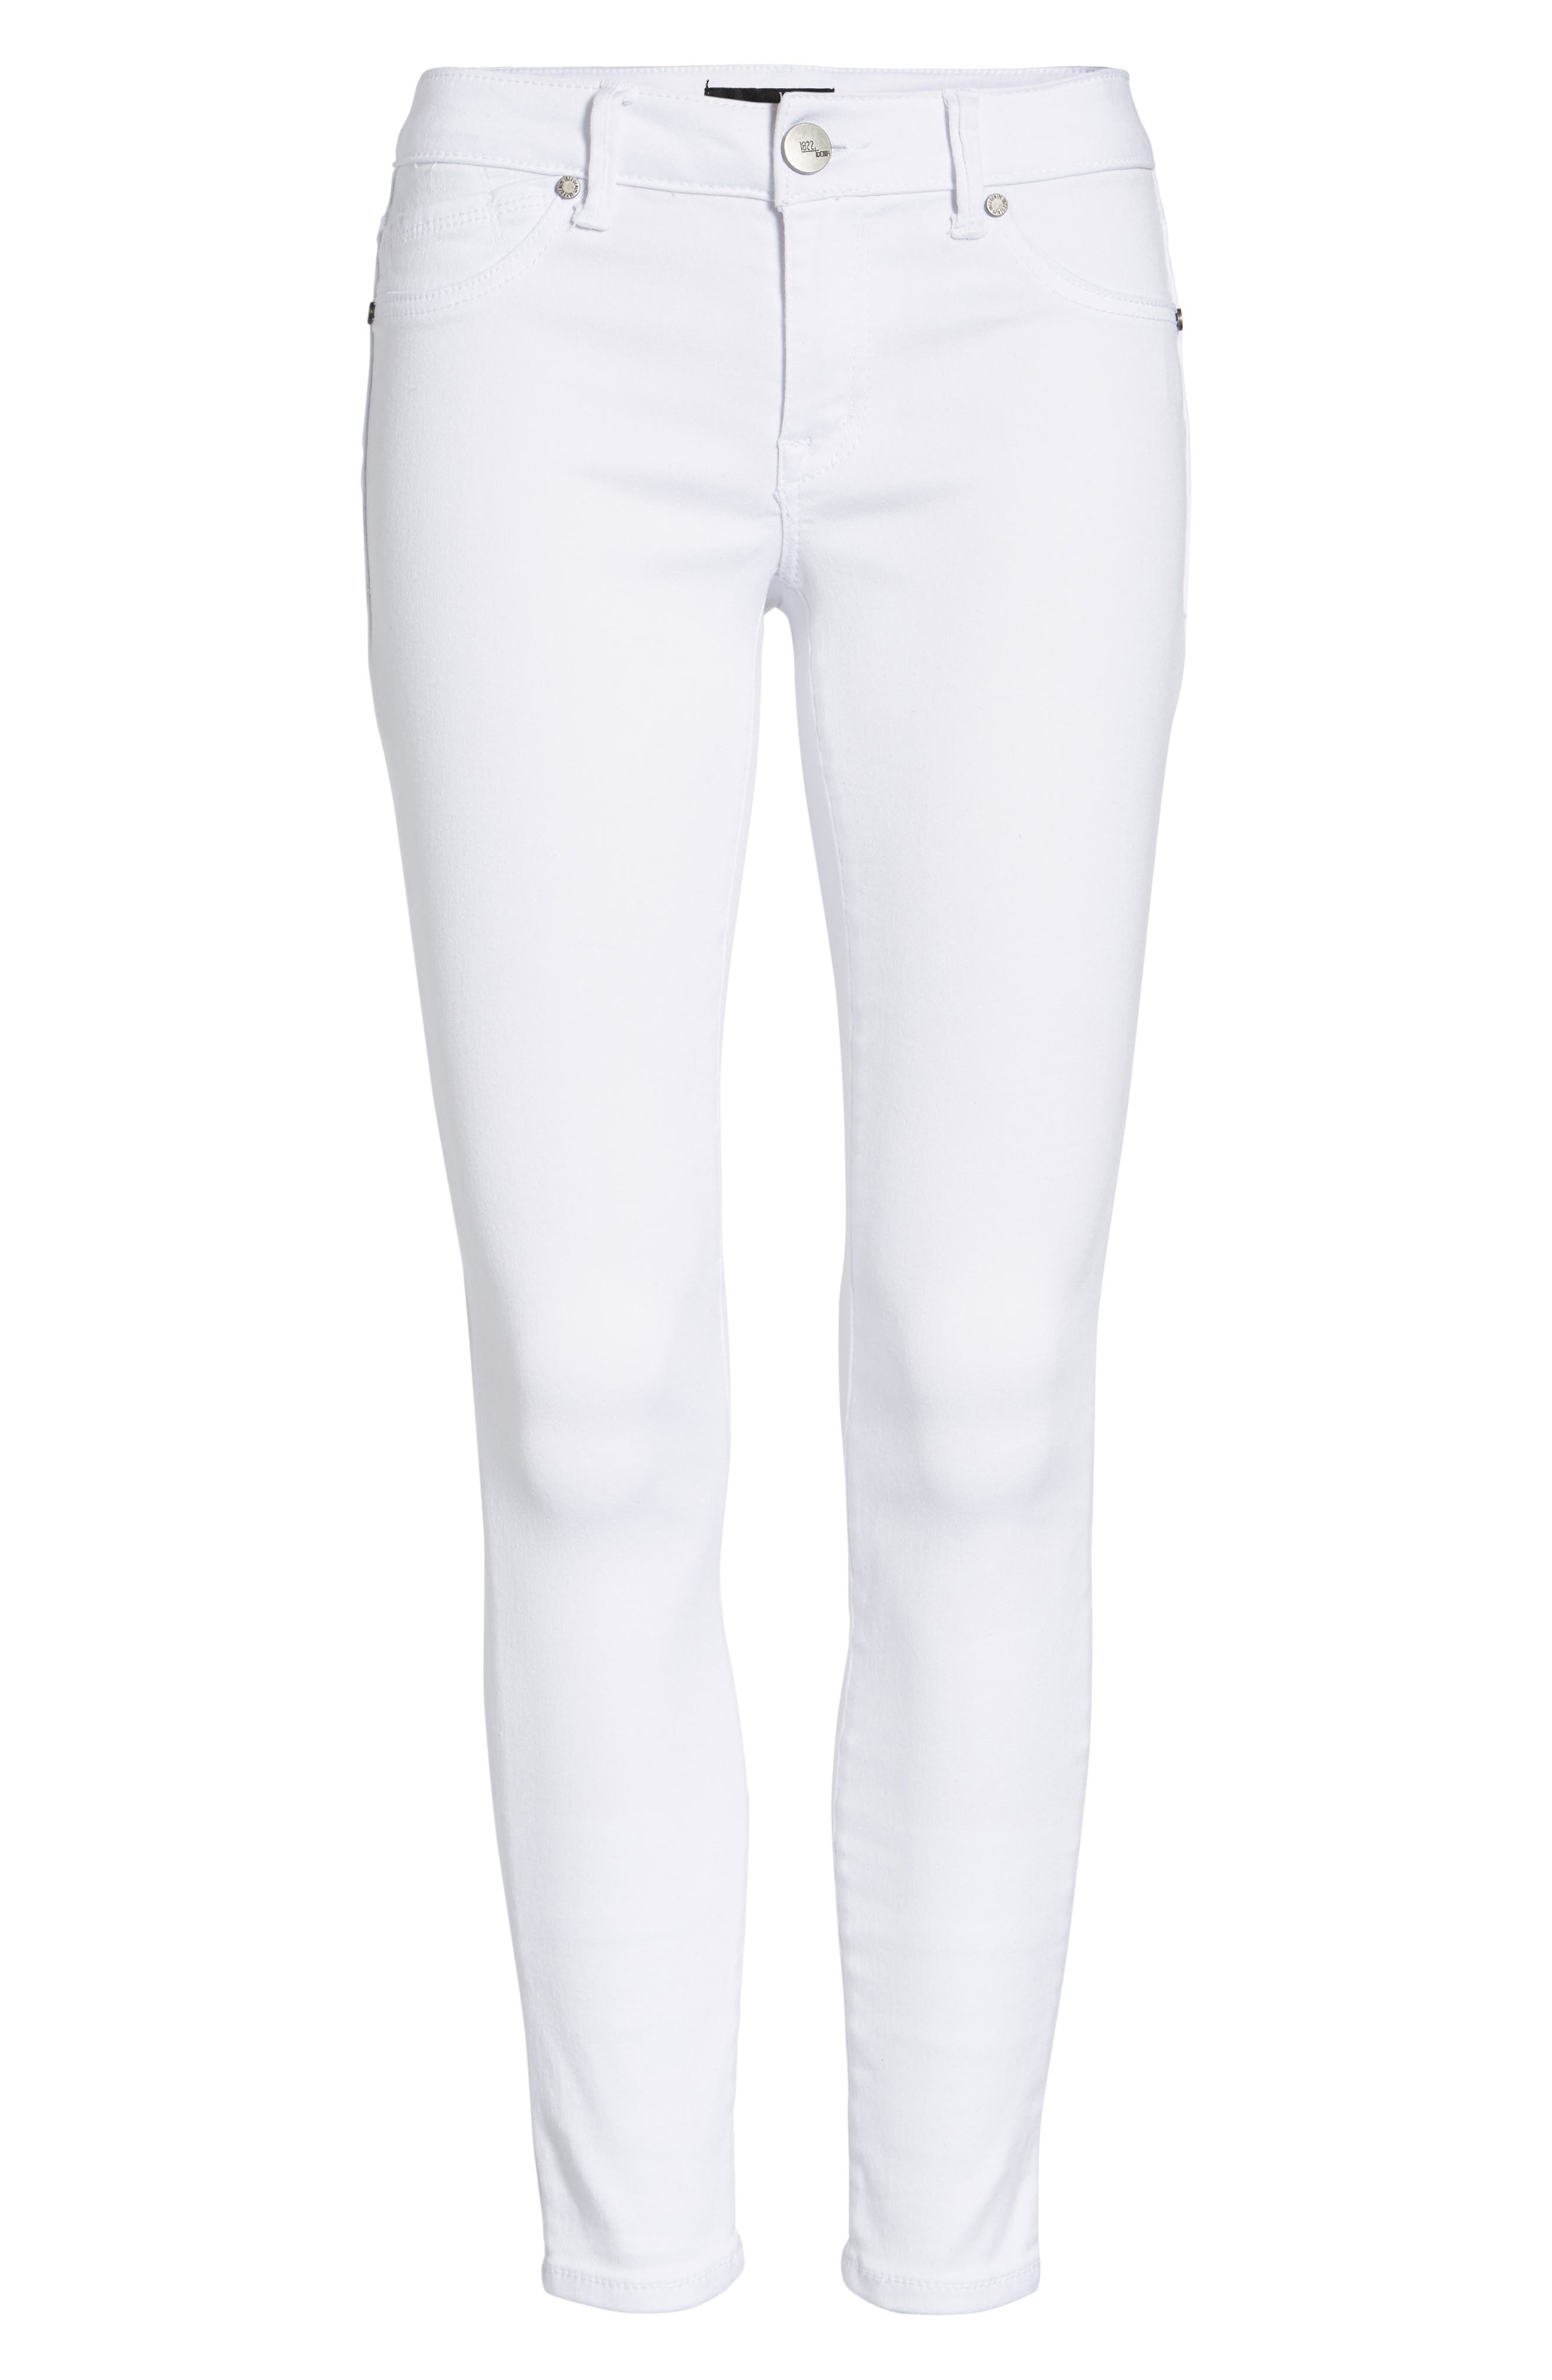 1822 Butter Skinny Jeans,                             Alternate thumbnail 6, color,